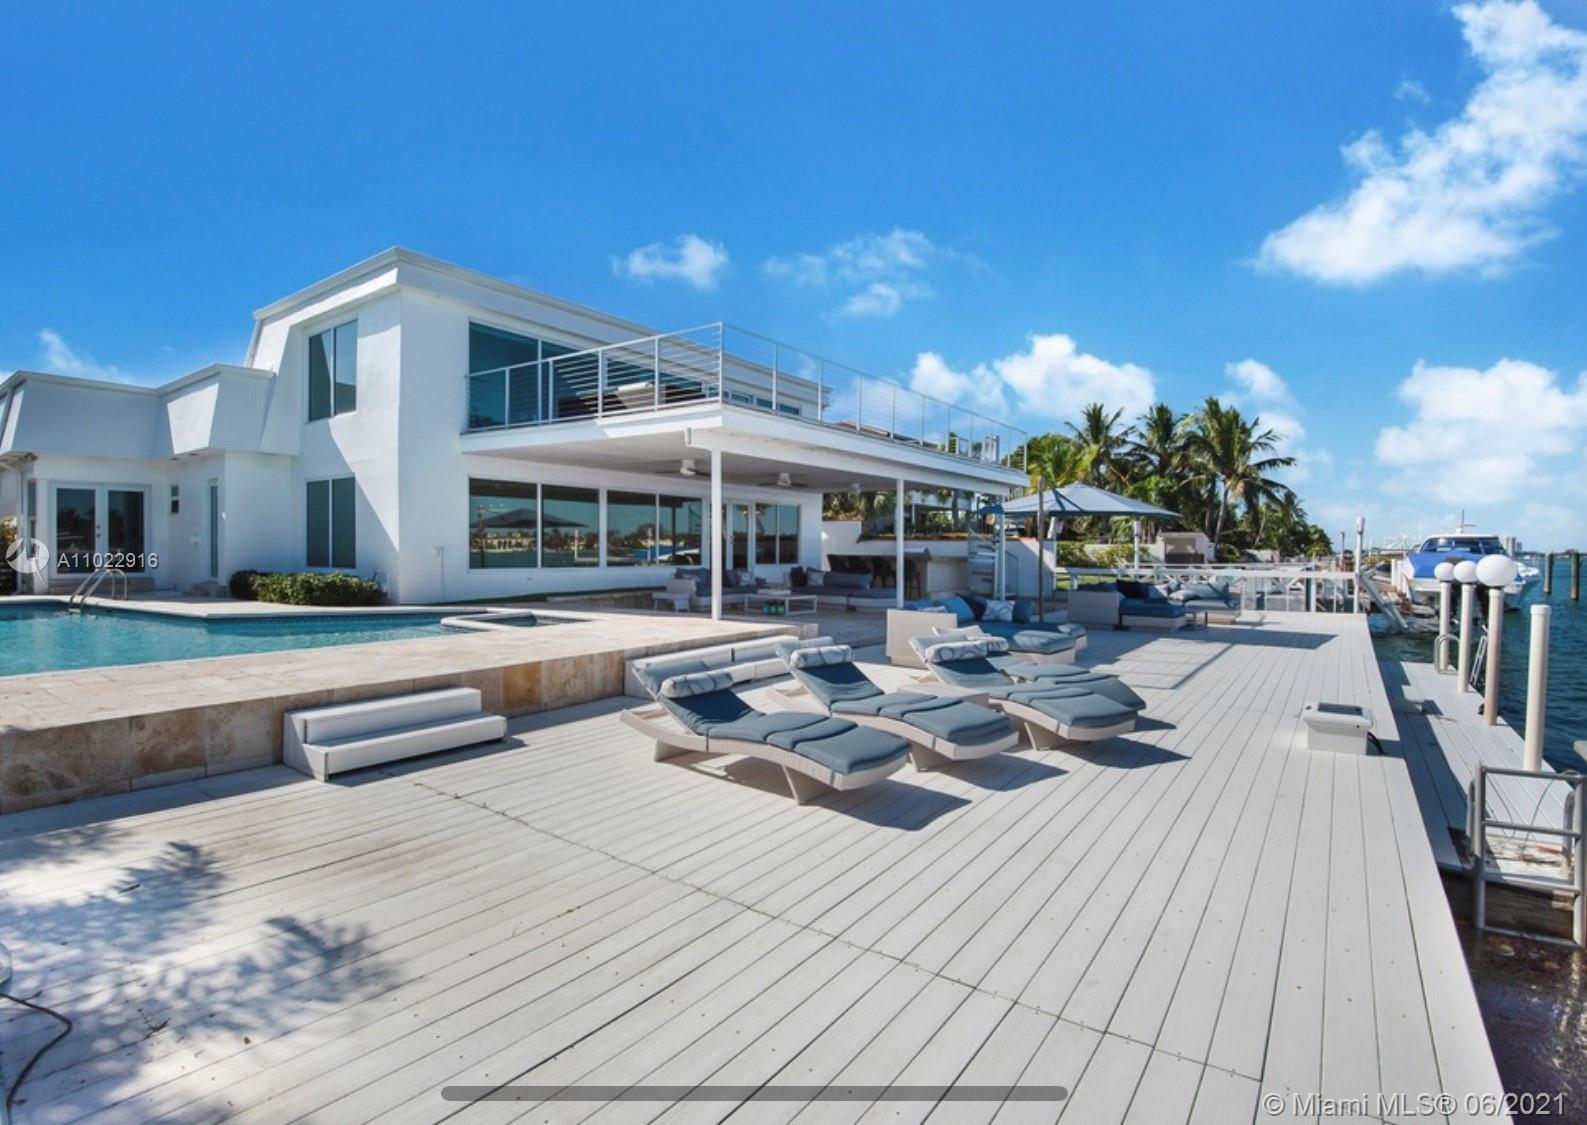 1055 Stillwater Dr, Miami Beach, Florida 33141